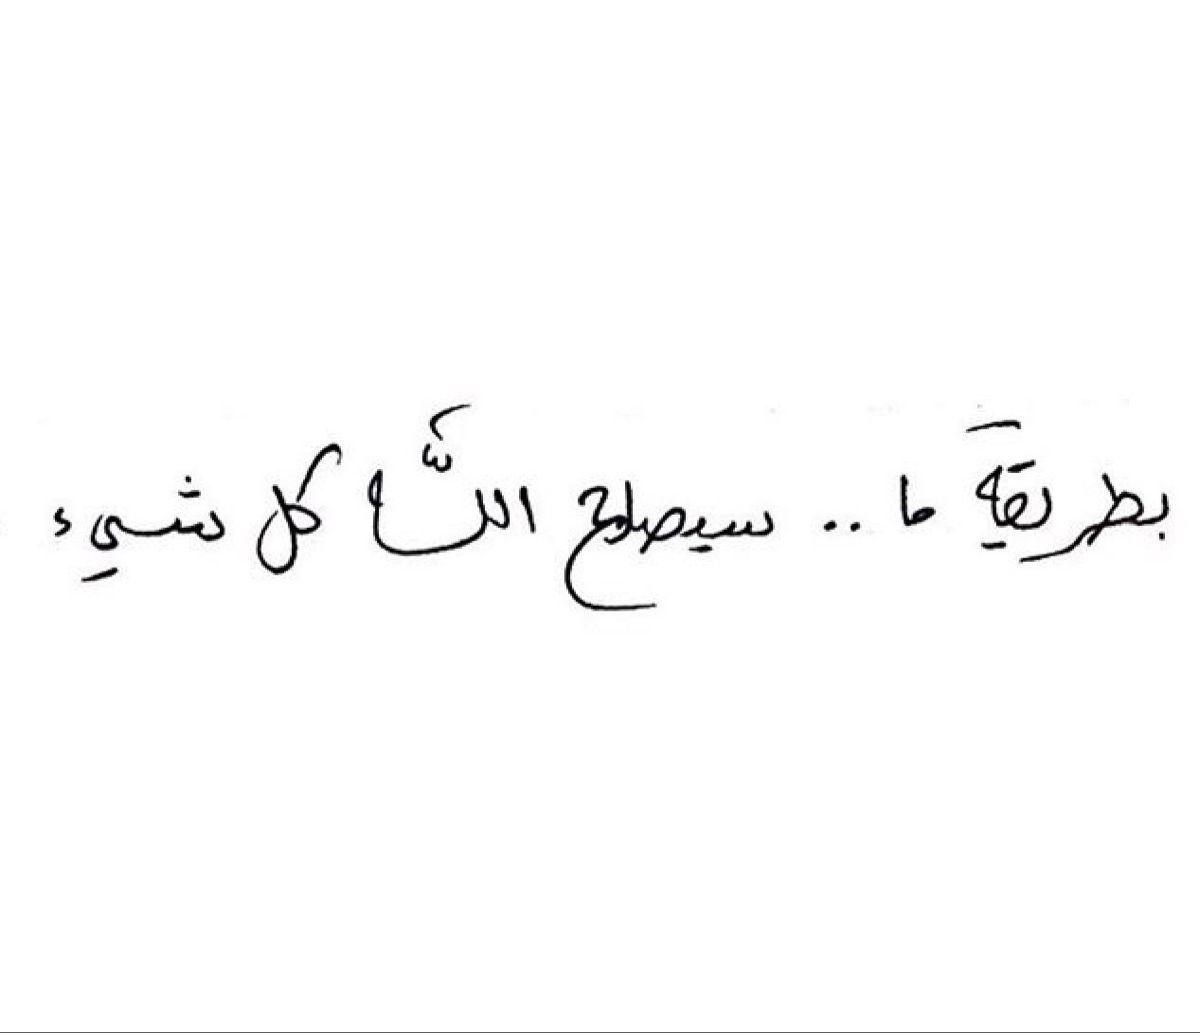 Pin By Aishaalkandari On Hanker Photo Quotes Calligraphy Arabic Calligraphy